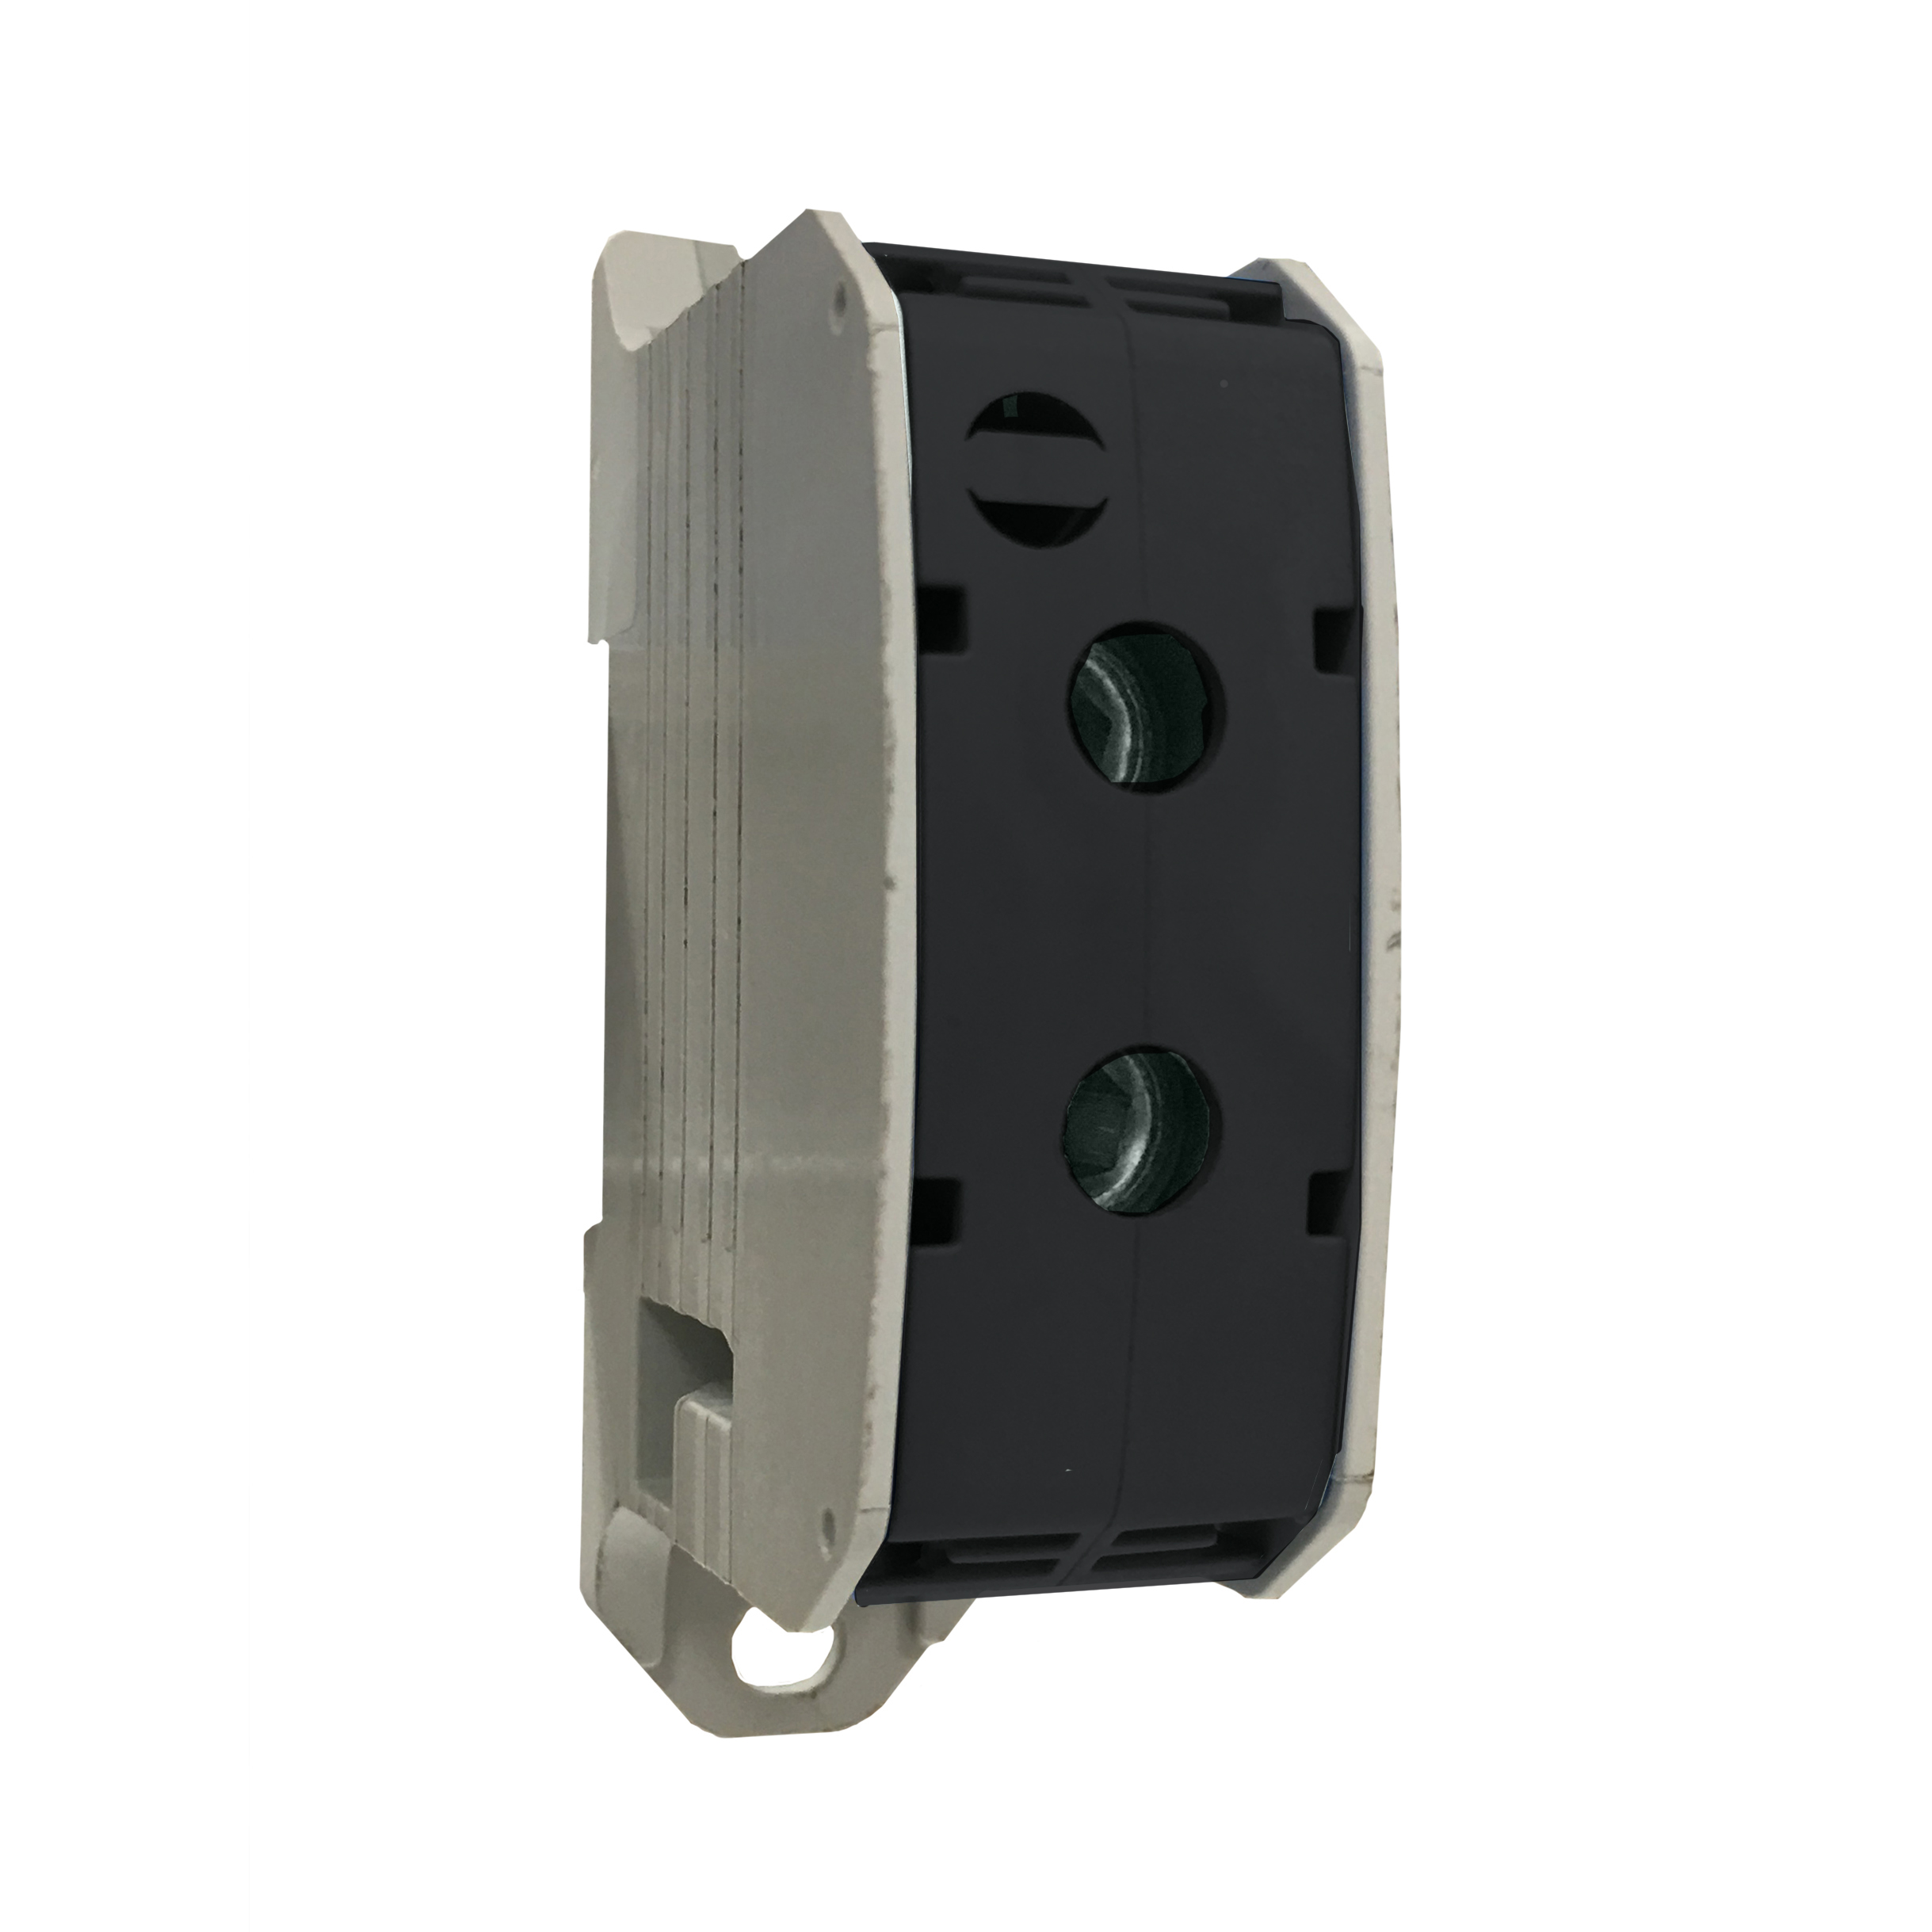 1 Stk Aluminium /Kupfer Klemme, 1-polig, 95mm² schwarz IKA21450--